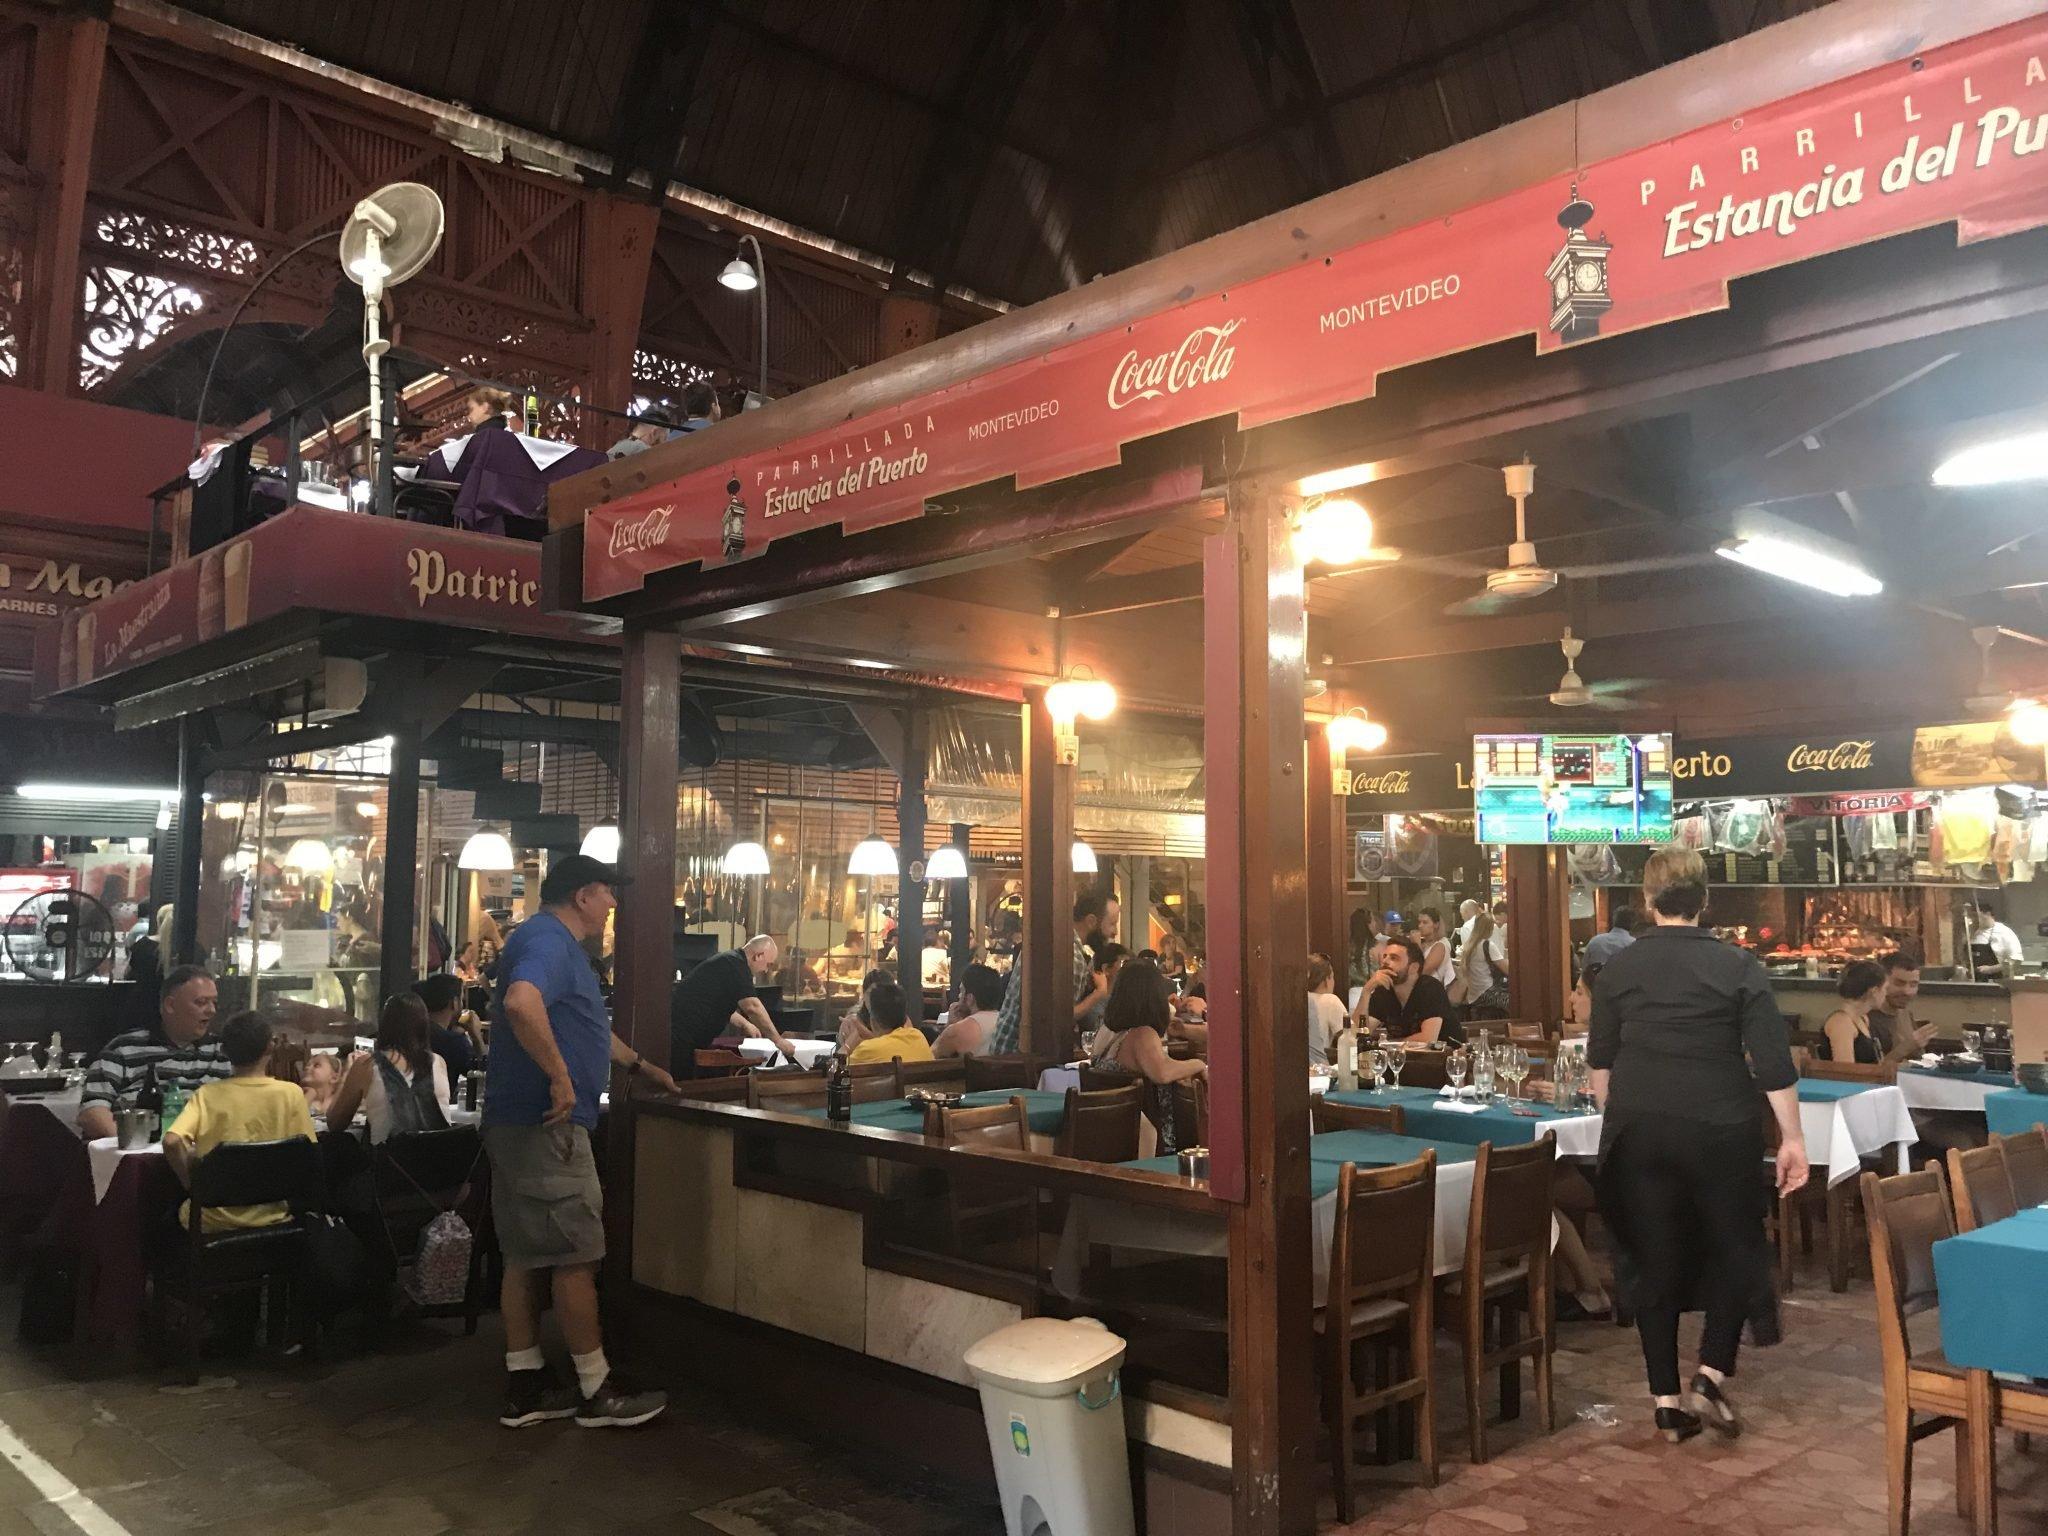 O Mercado do Porto de Montevideo: ponto turístico e gastronômico